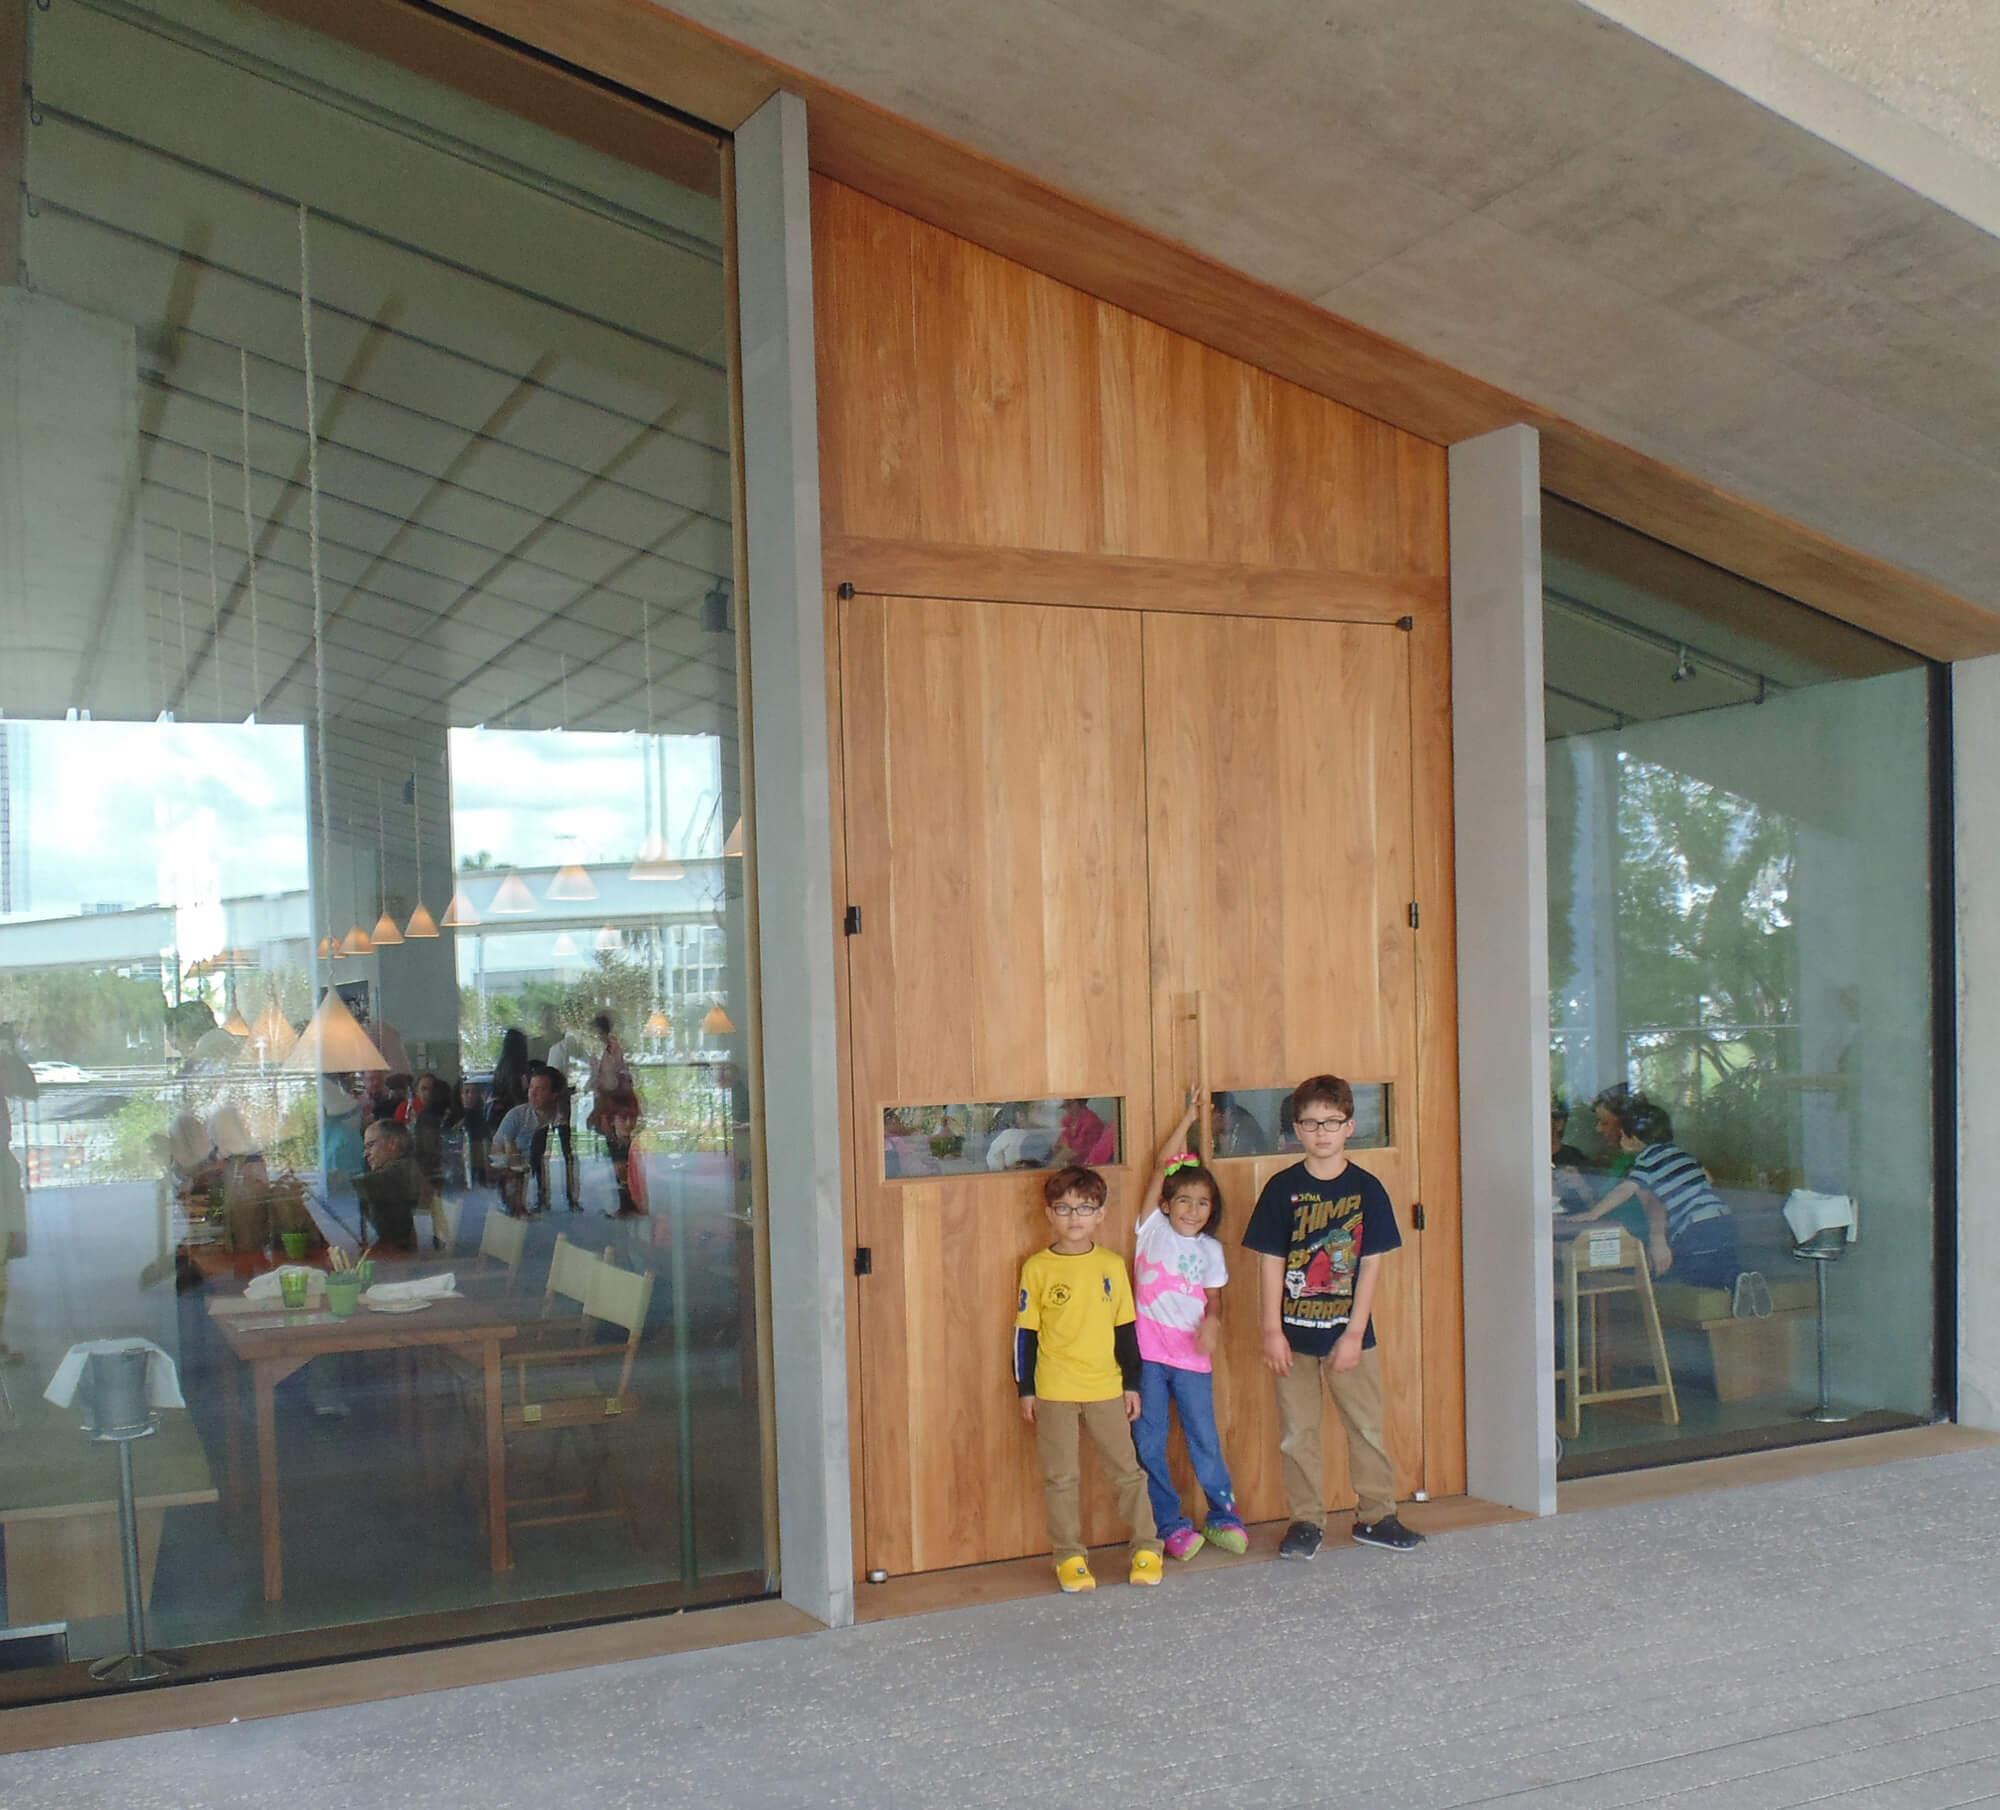 TEAK ENTRANCE DOORS TO RESTAURANT IN THE MIAMI PEREZ ART MUSEUM.